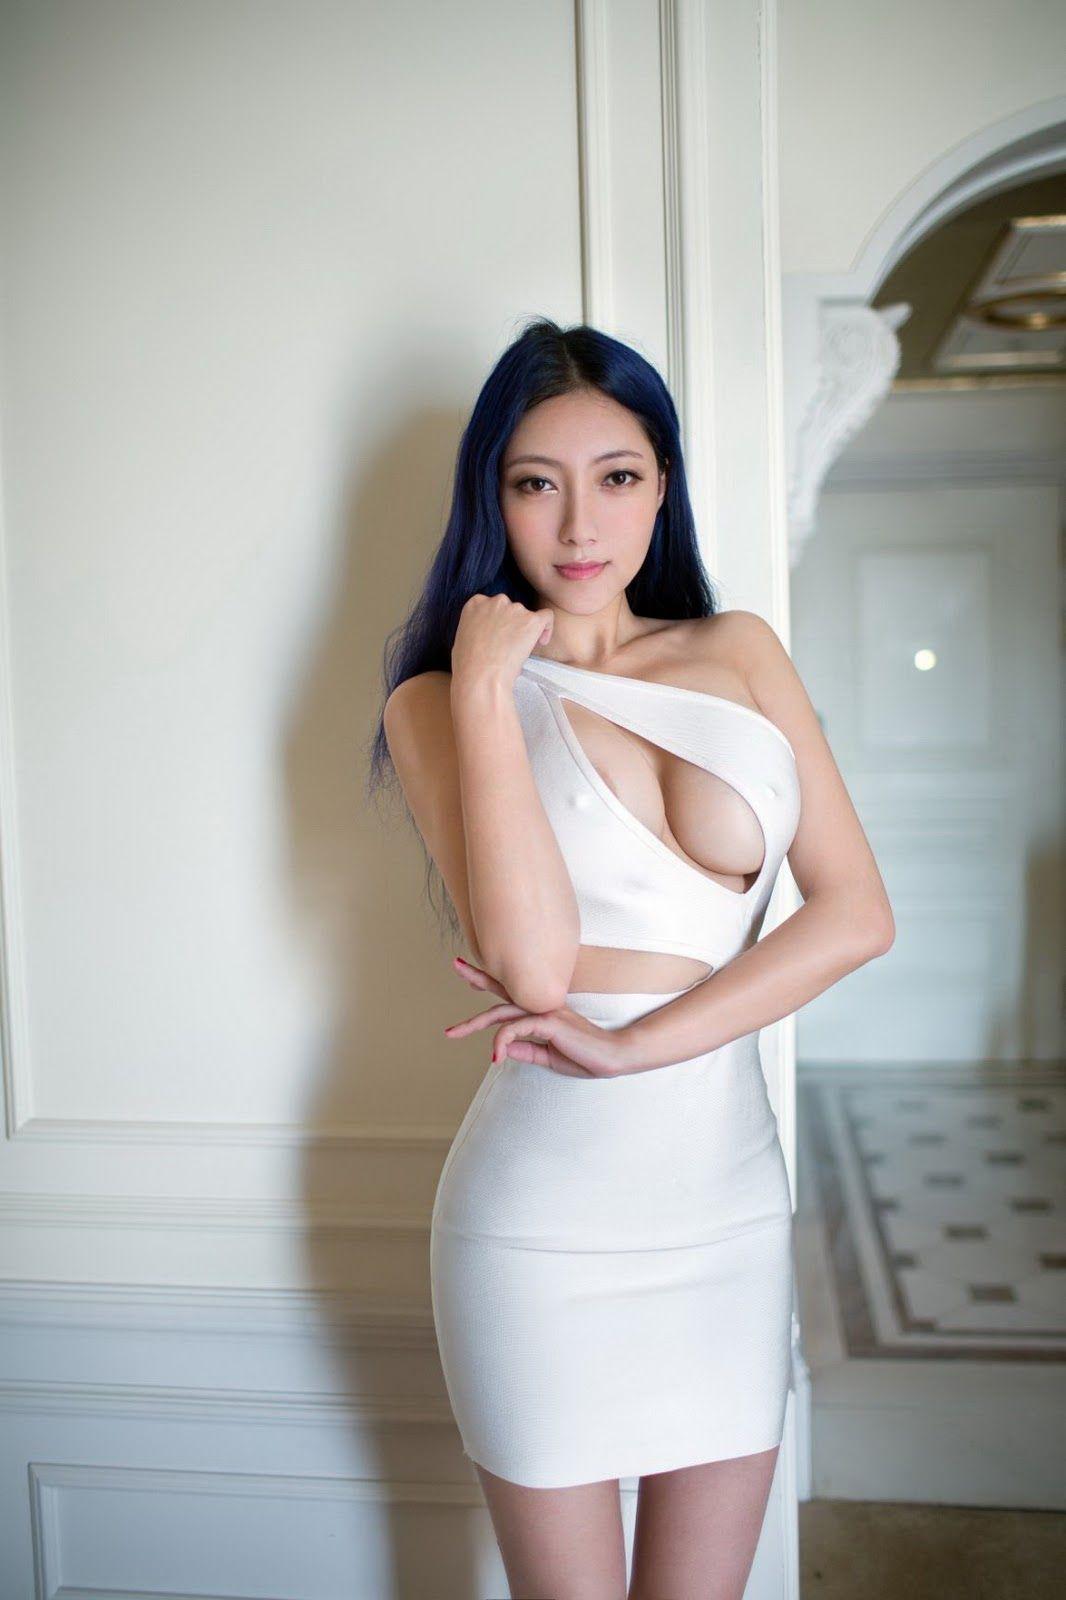 Nude female asian models